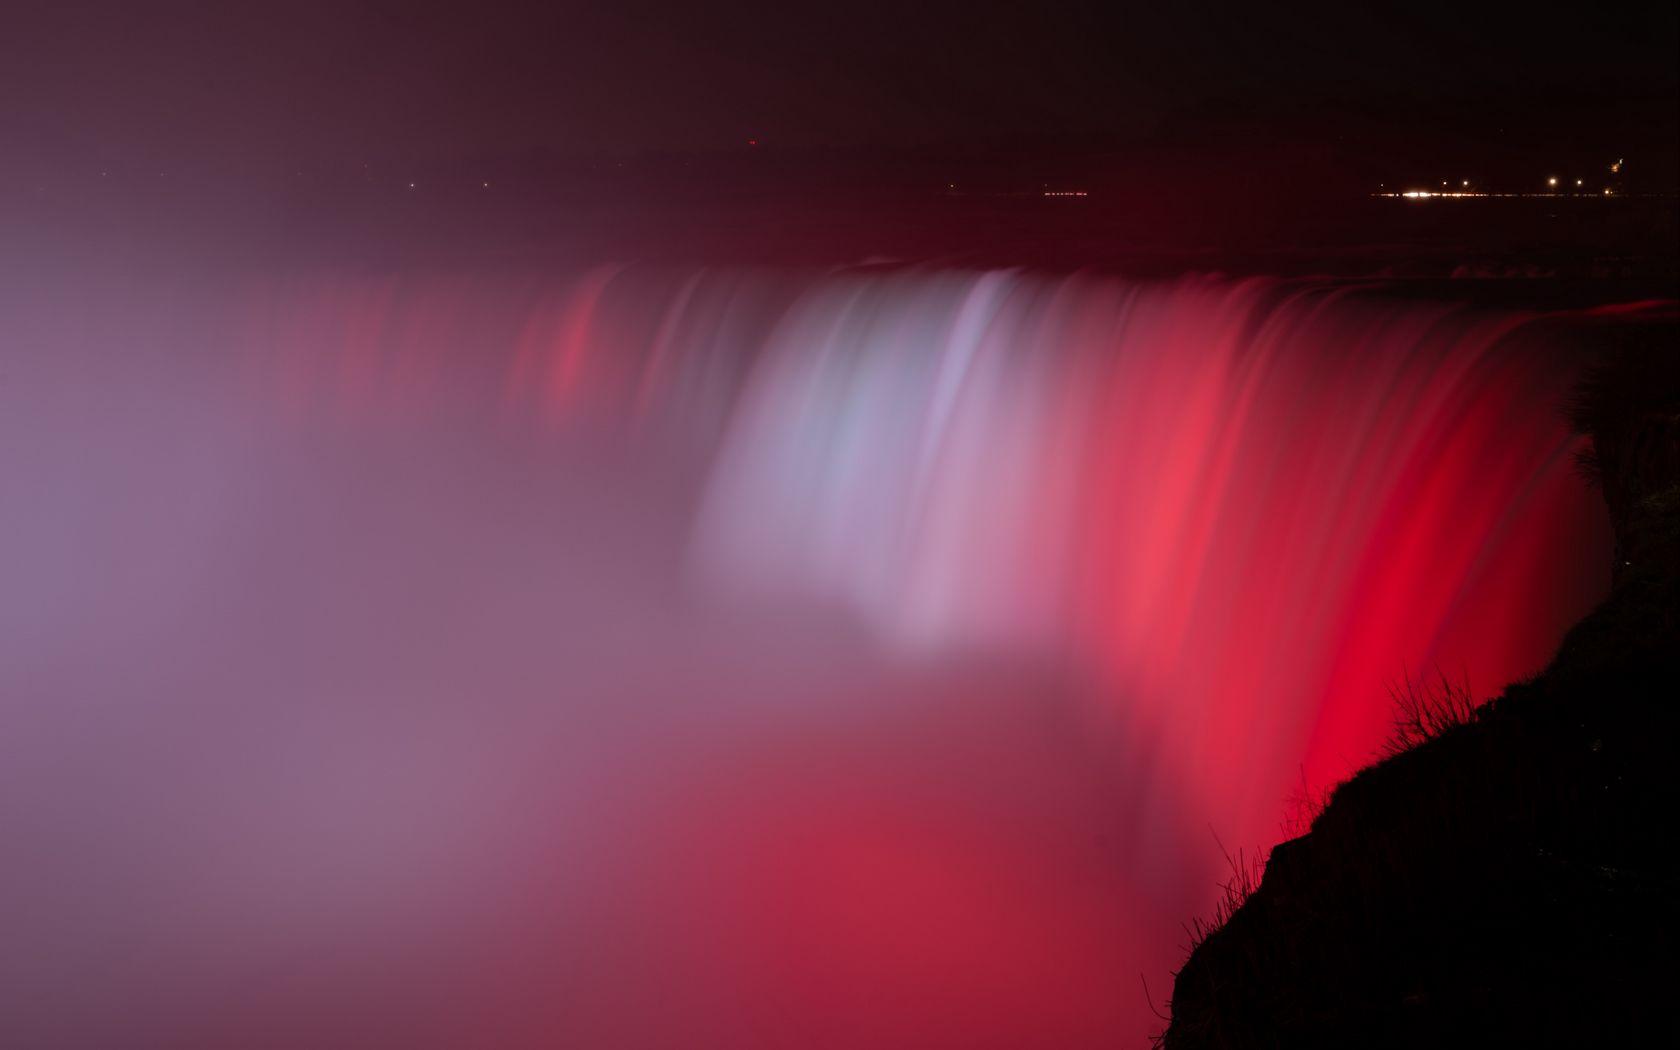 1680x1050 Wallpaper waterfall, fog, backlight, red, dark